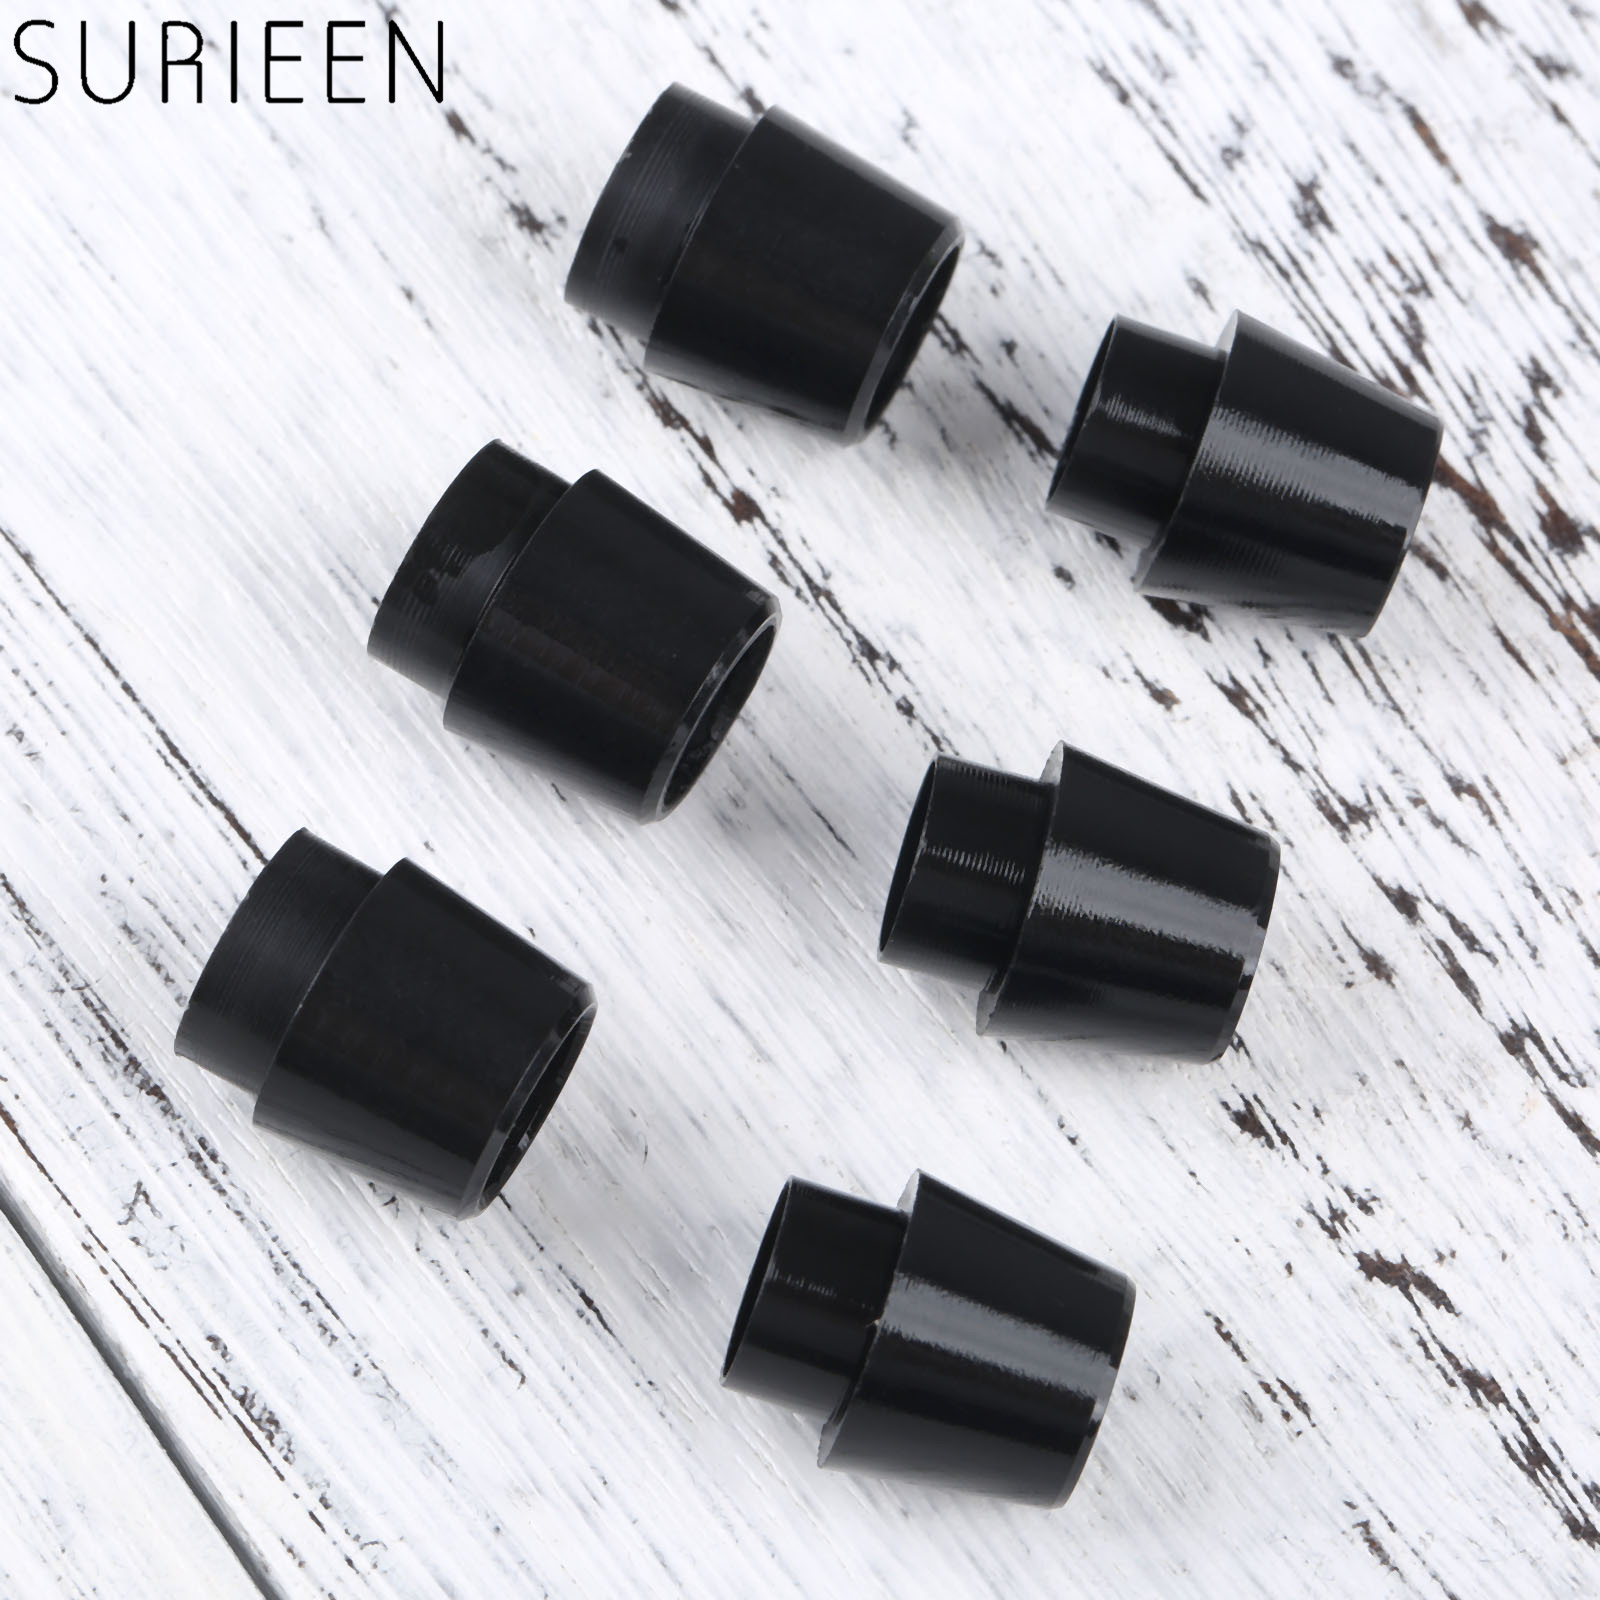 SURIEEN 5Pcs/Lot Black Golf Ferrules Fit For Callaway 815 RAZRX-hot2 Shaft Sleeve Adapter Tip Size 0.335 /0.350 Golf Accessories